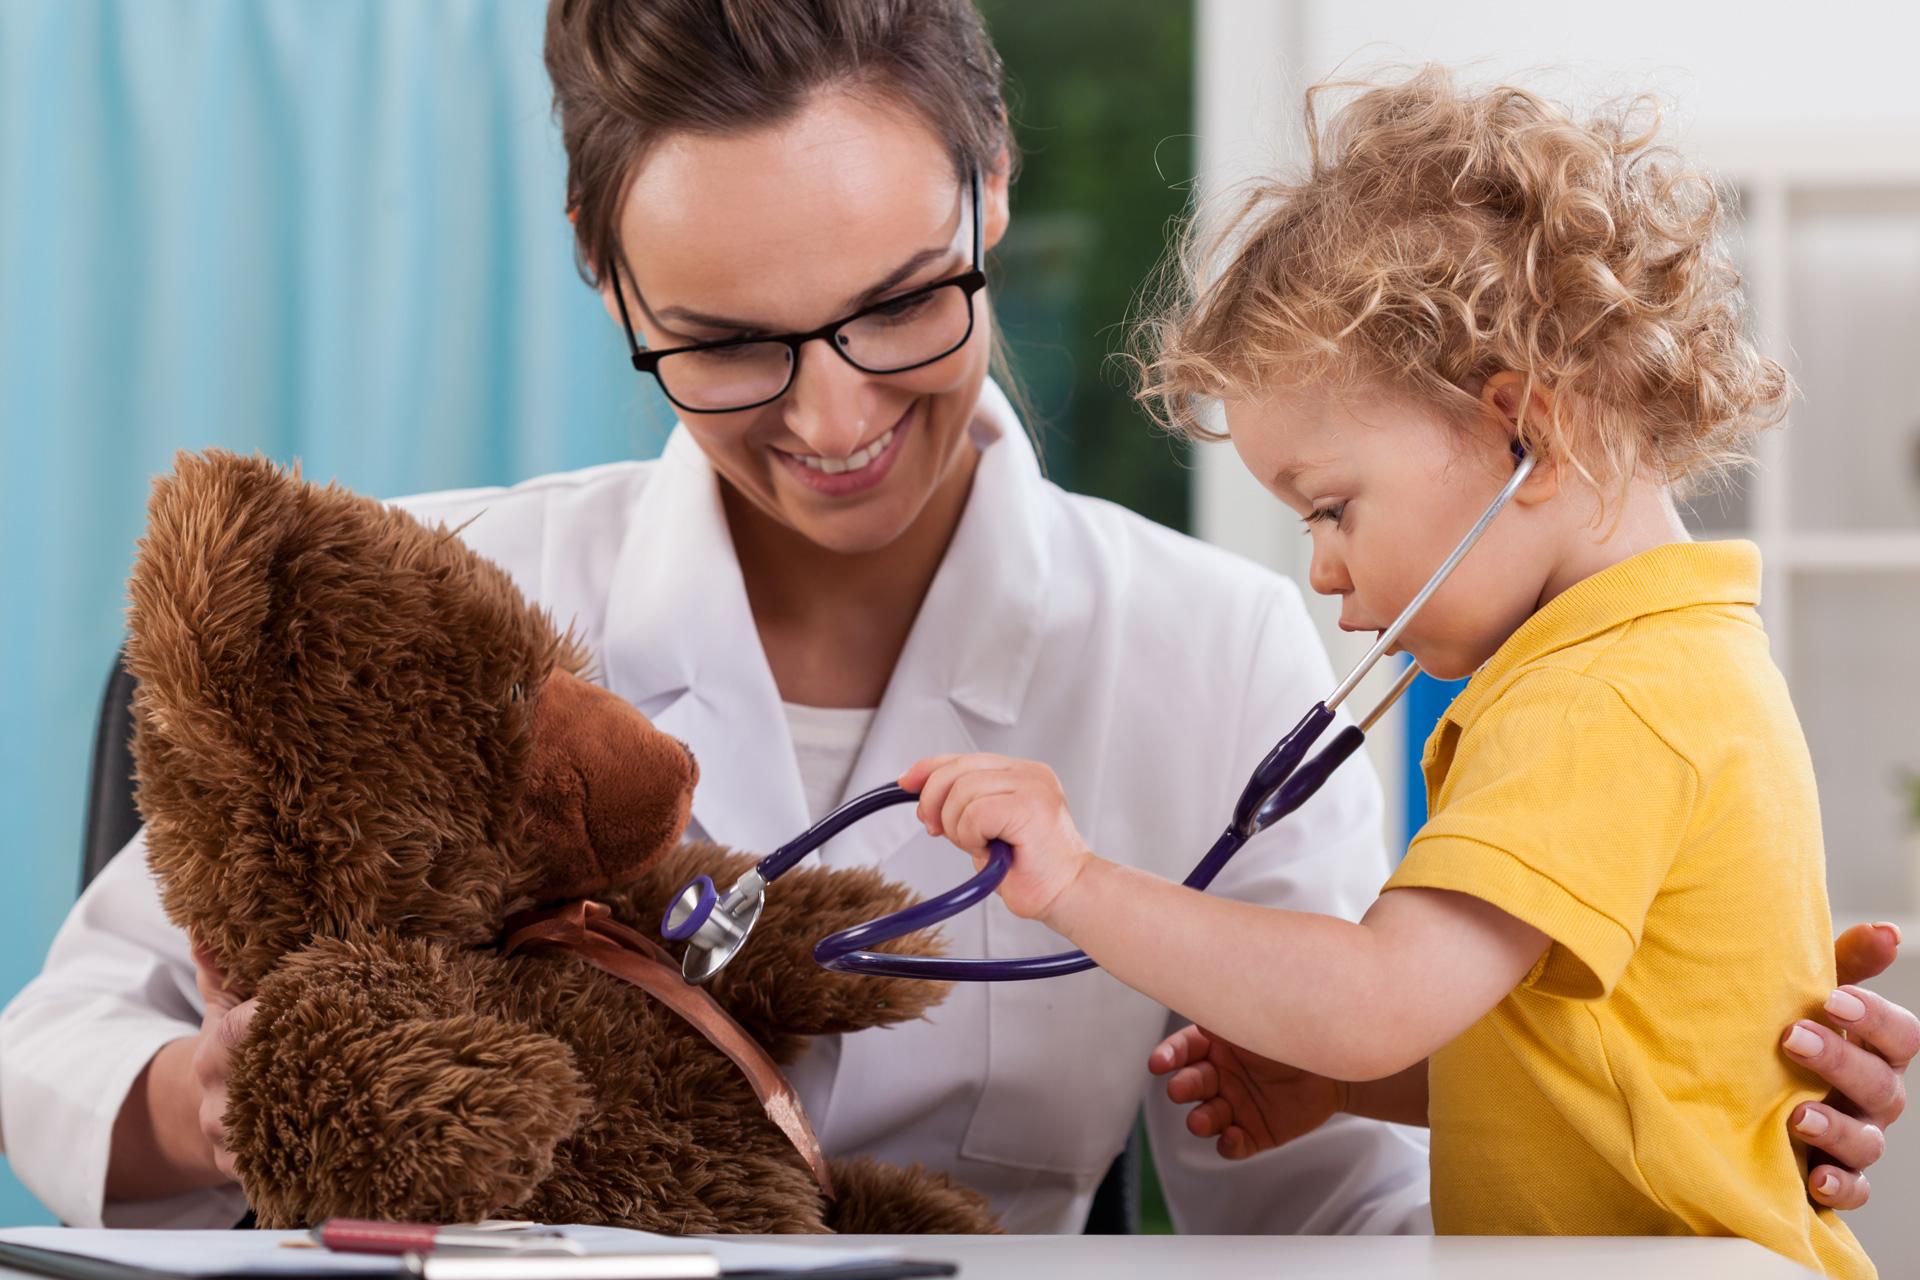 ambulatori-pediatrici-mobili-veicoli-medicali